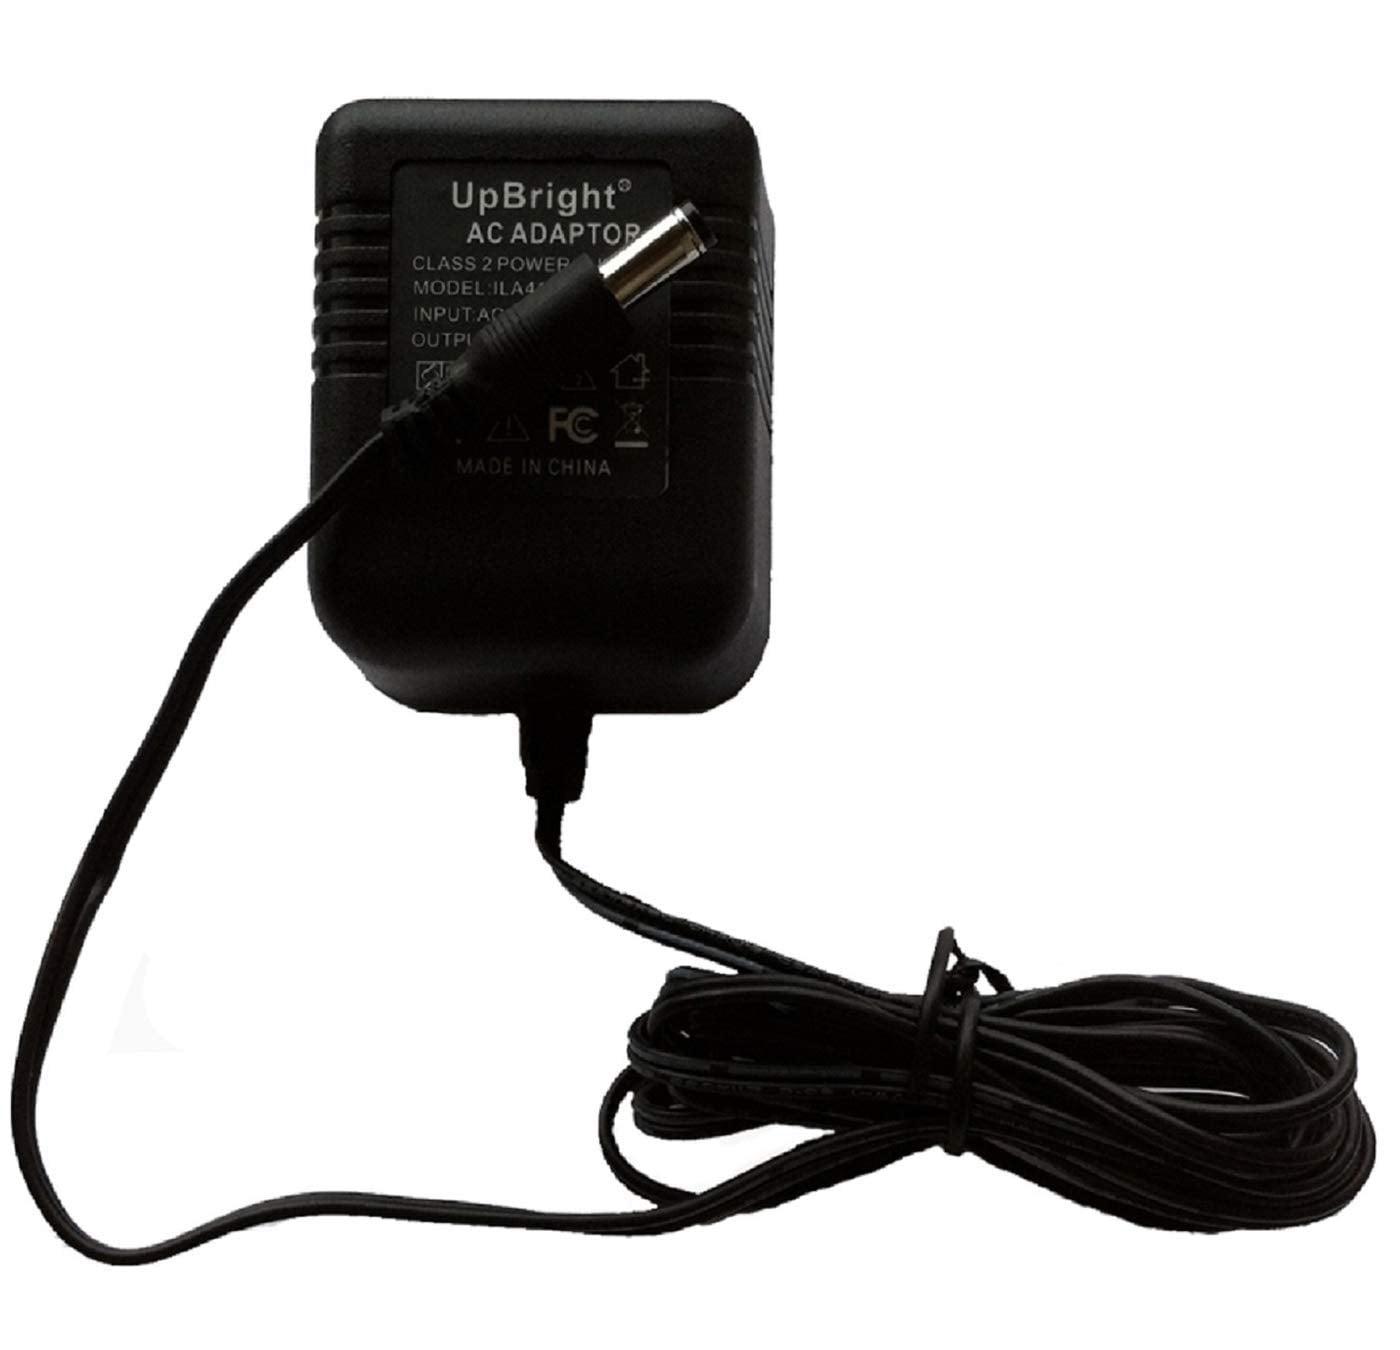 UPBRIGHT New AC6V AC Adapter For VTECH CS6319 CS6319-2 CS6319-3 CS6319-4 CS6319-5 Cordless Telephone ATT DECT 6.0 Phone Extra Handset Charging Cradle (Note: NOT DC6V. NOT Fit Main Base Unit